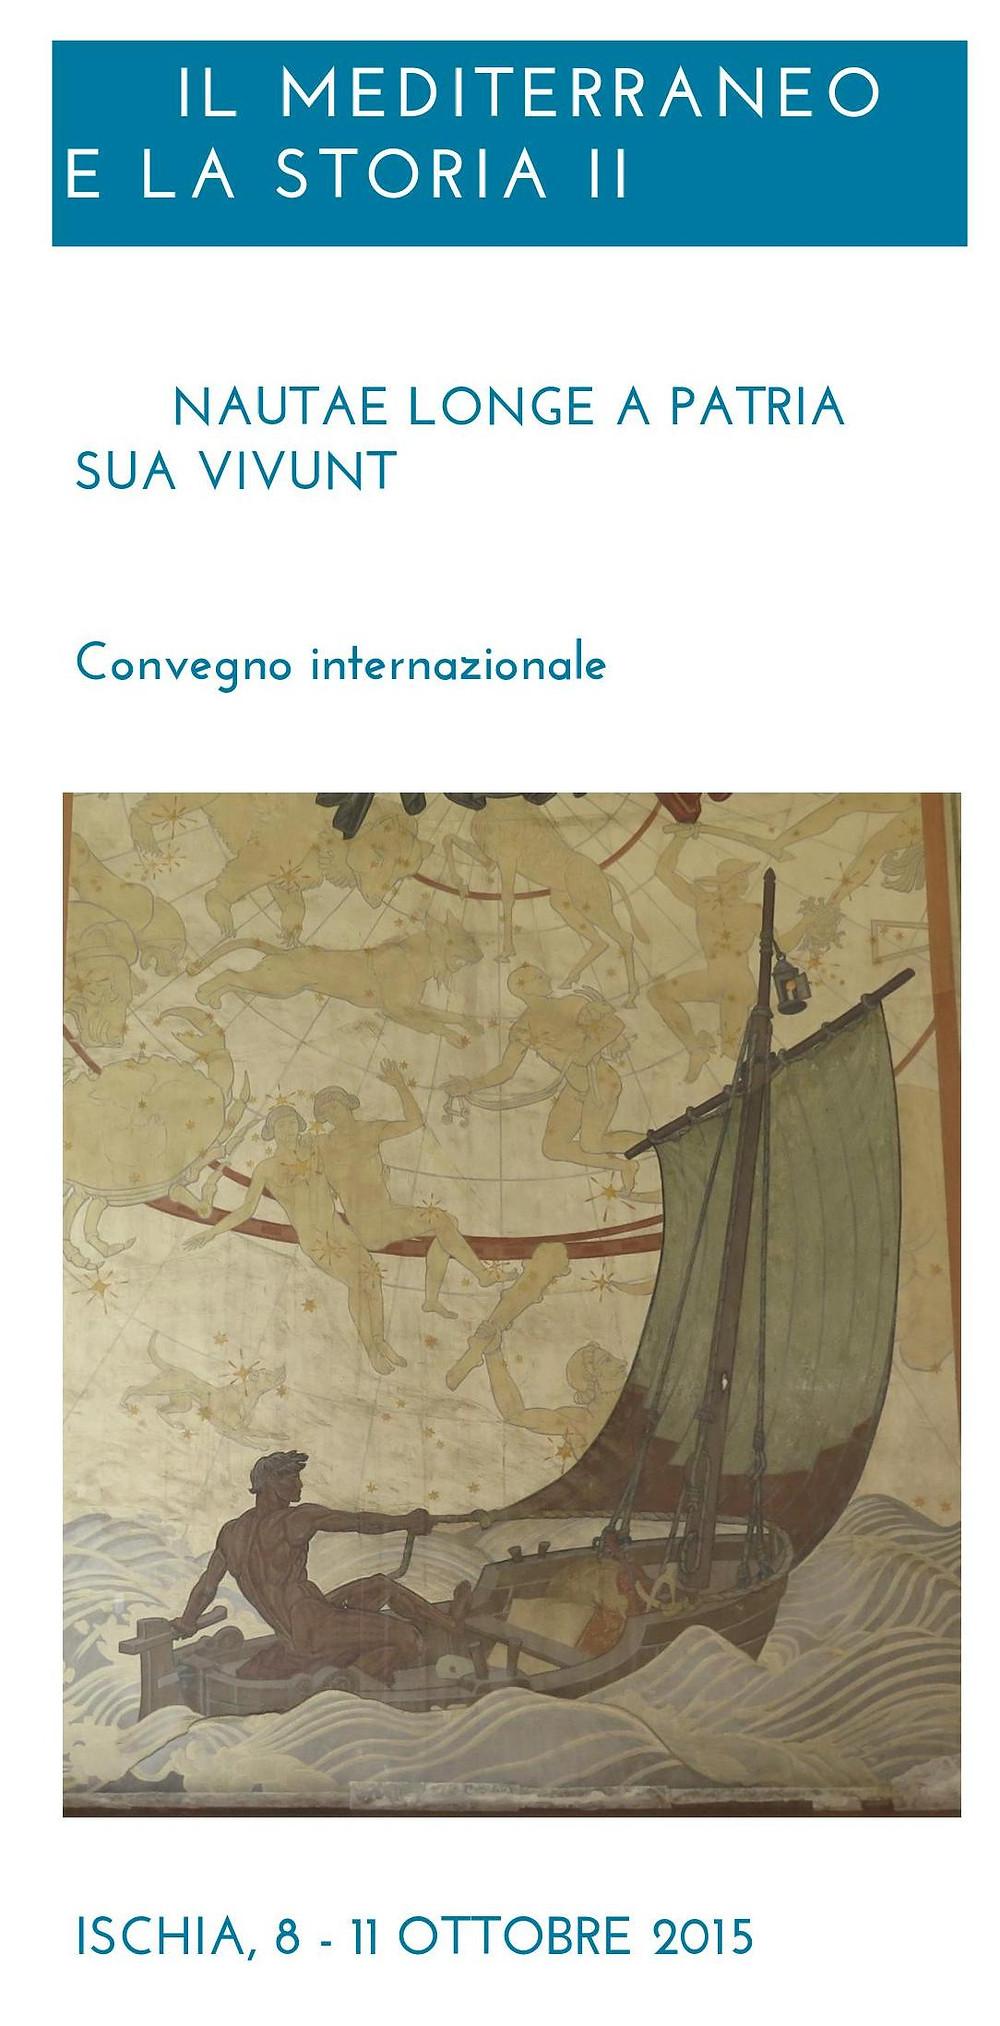 Il Mediterraneo e la storia. II, nautae longe a patria sua vivunt Ischia 2015.jpg